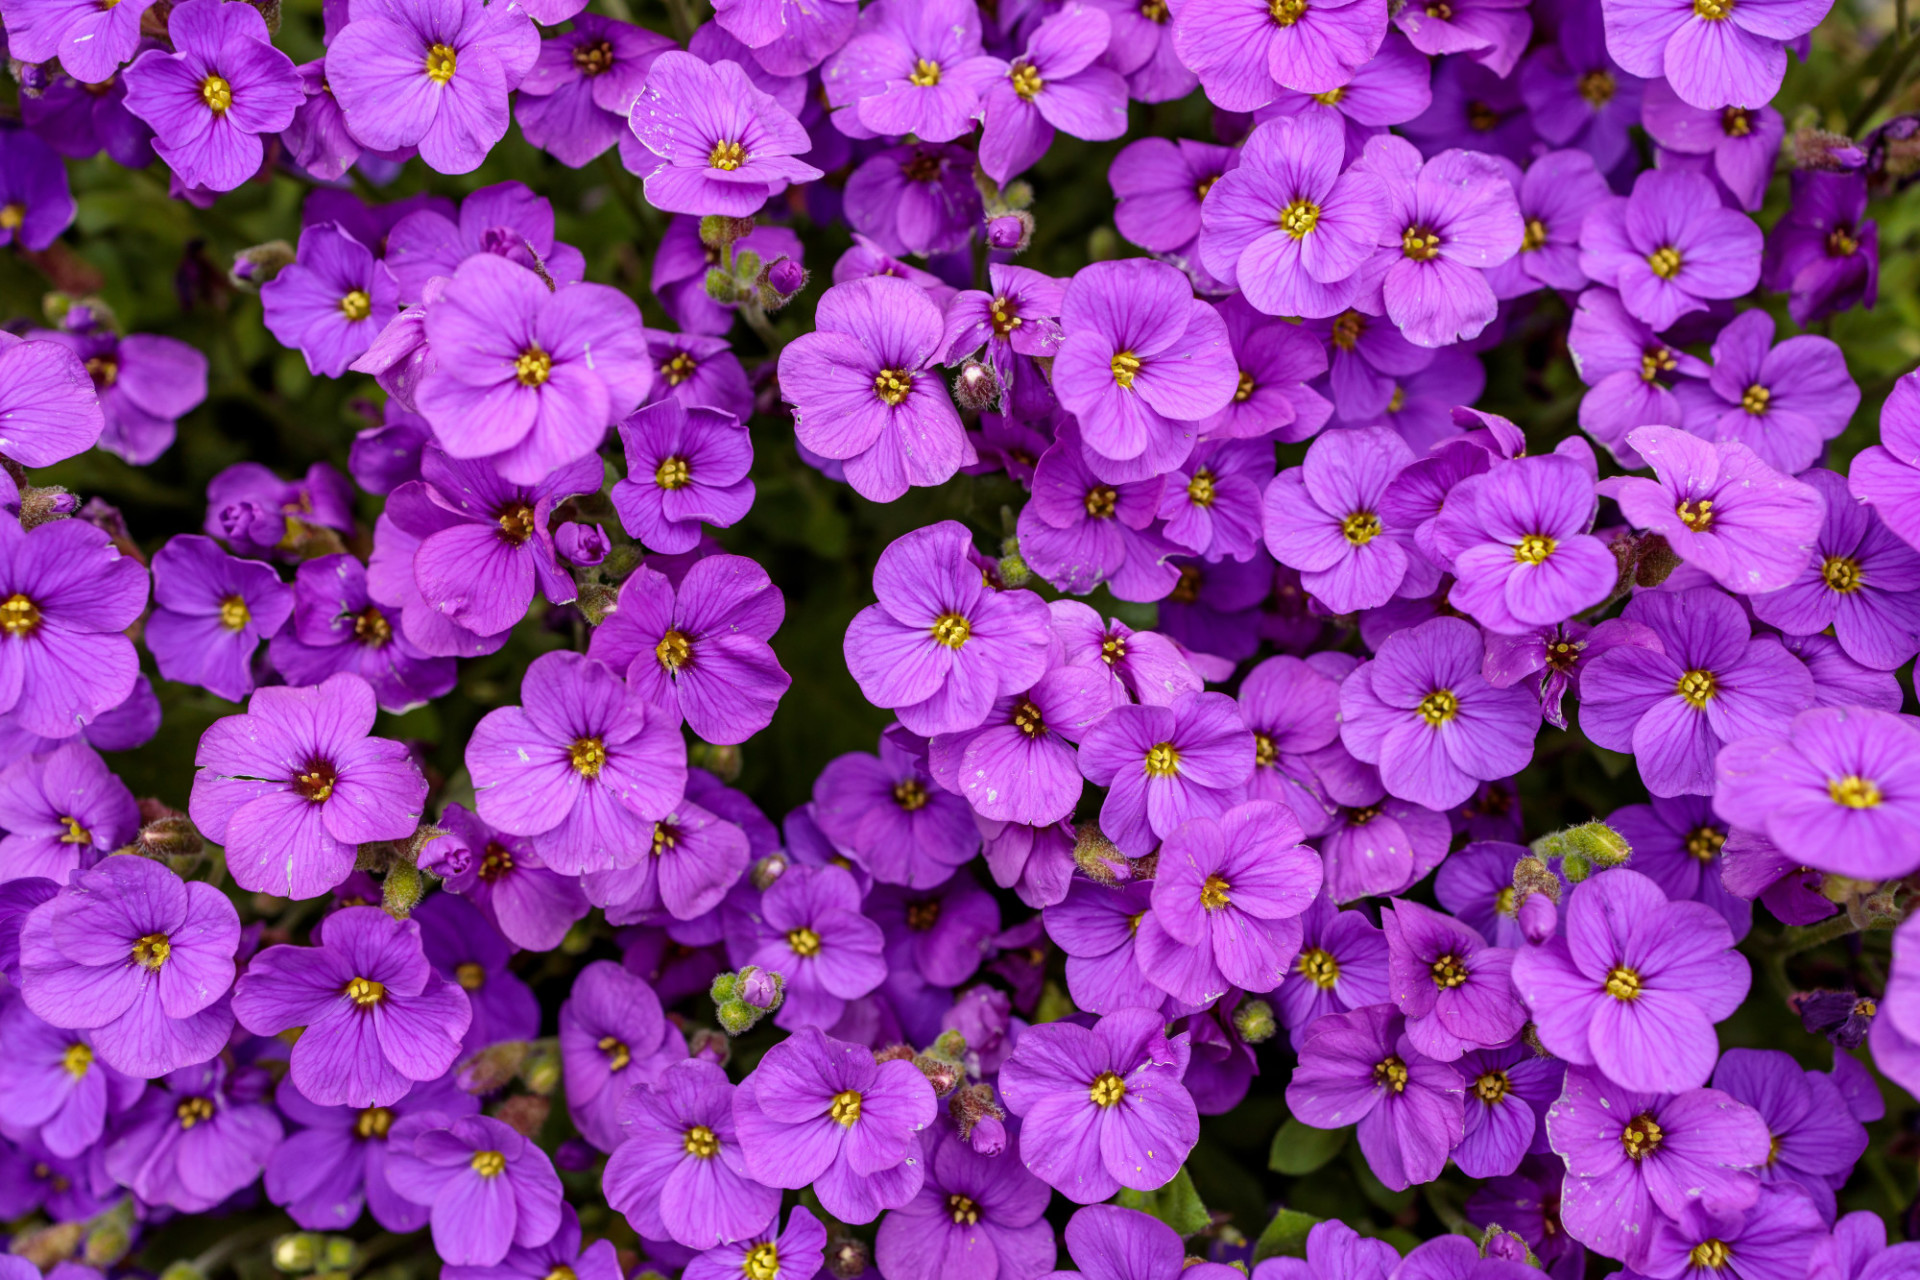 Aubrieta Violet Flowers Background